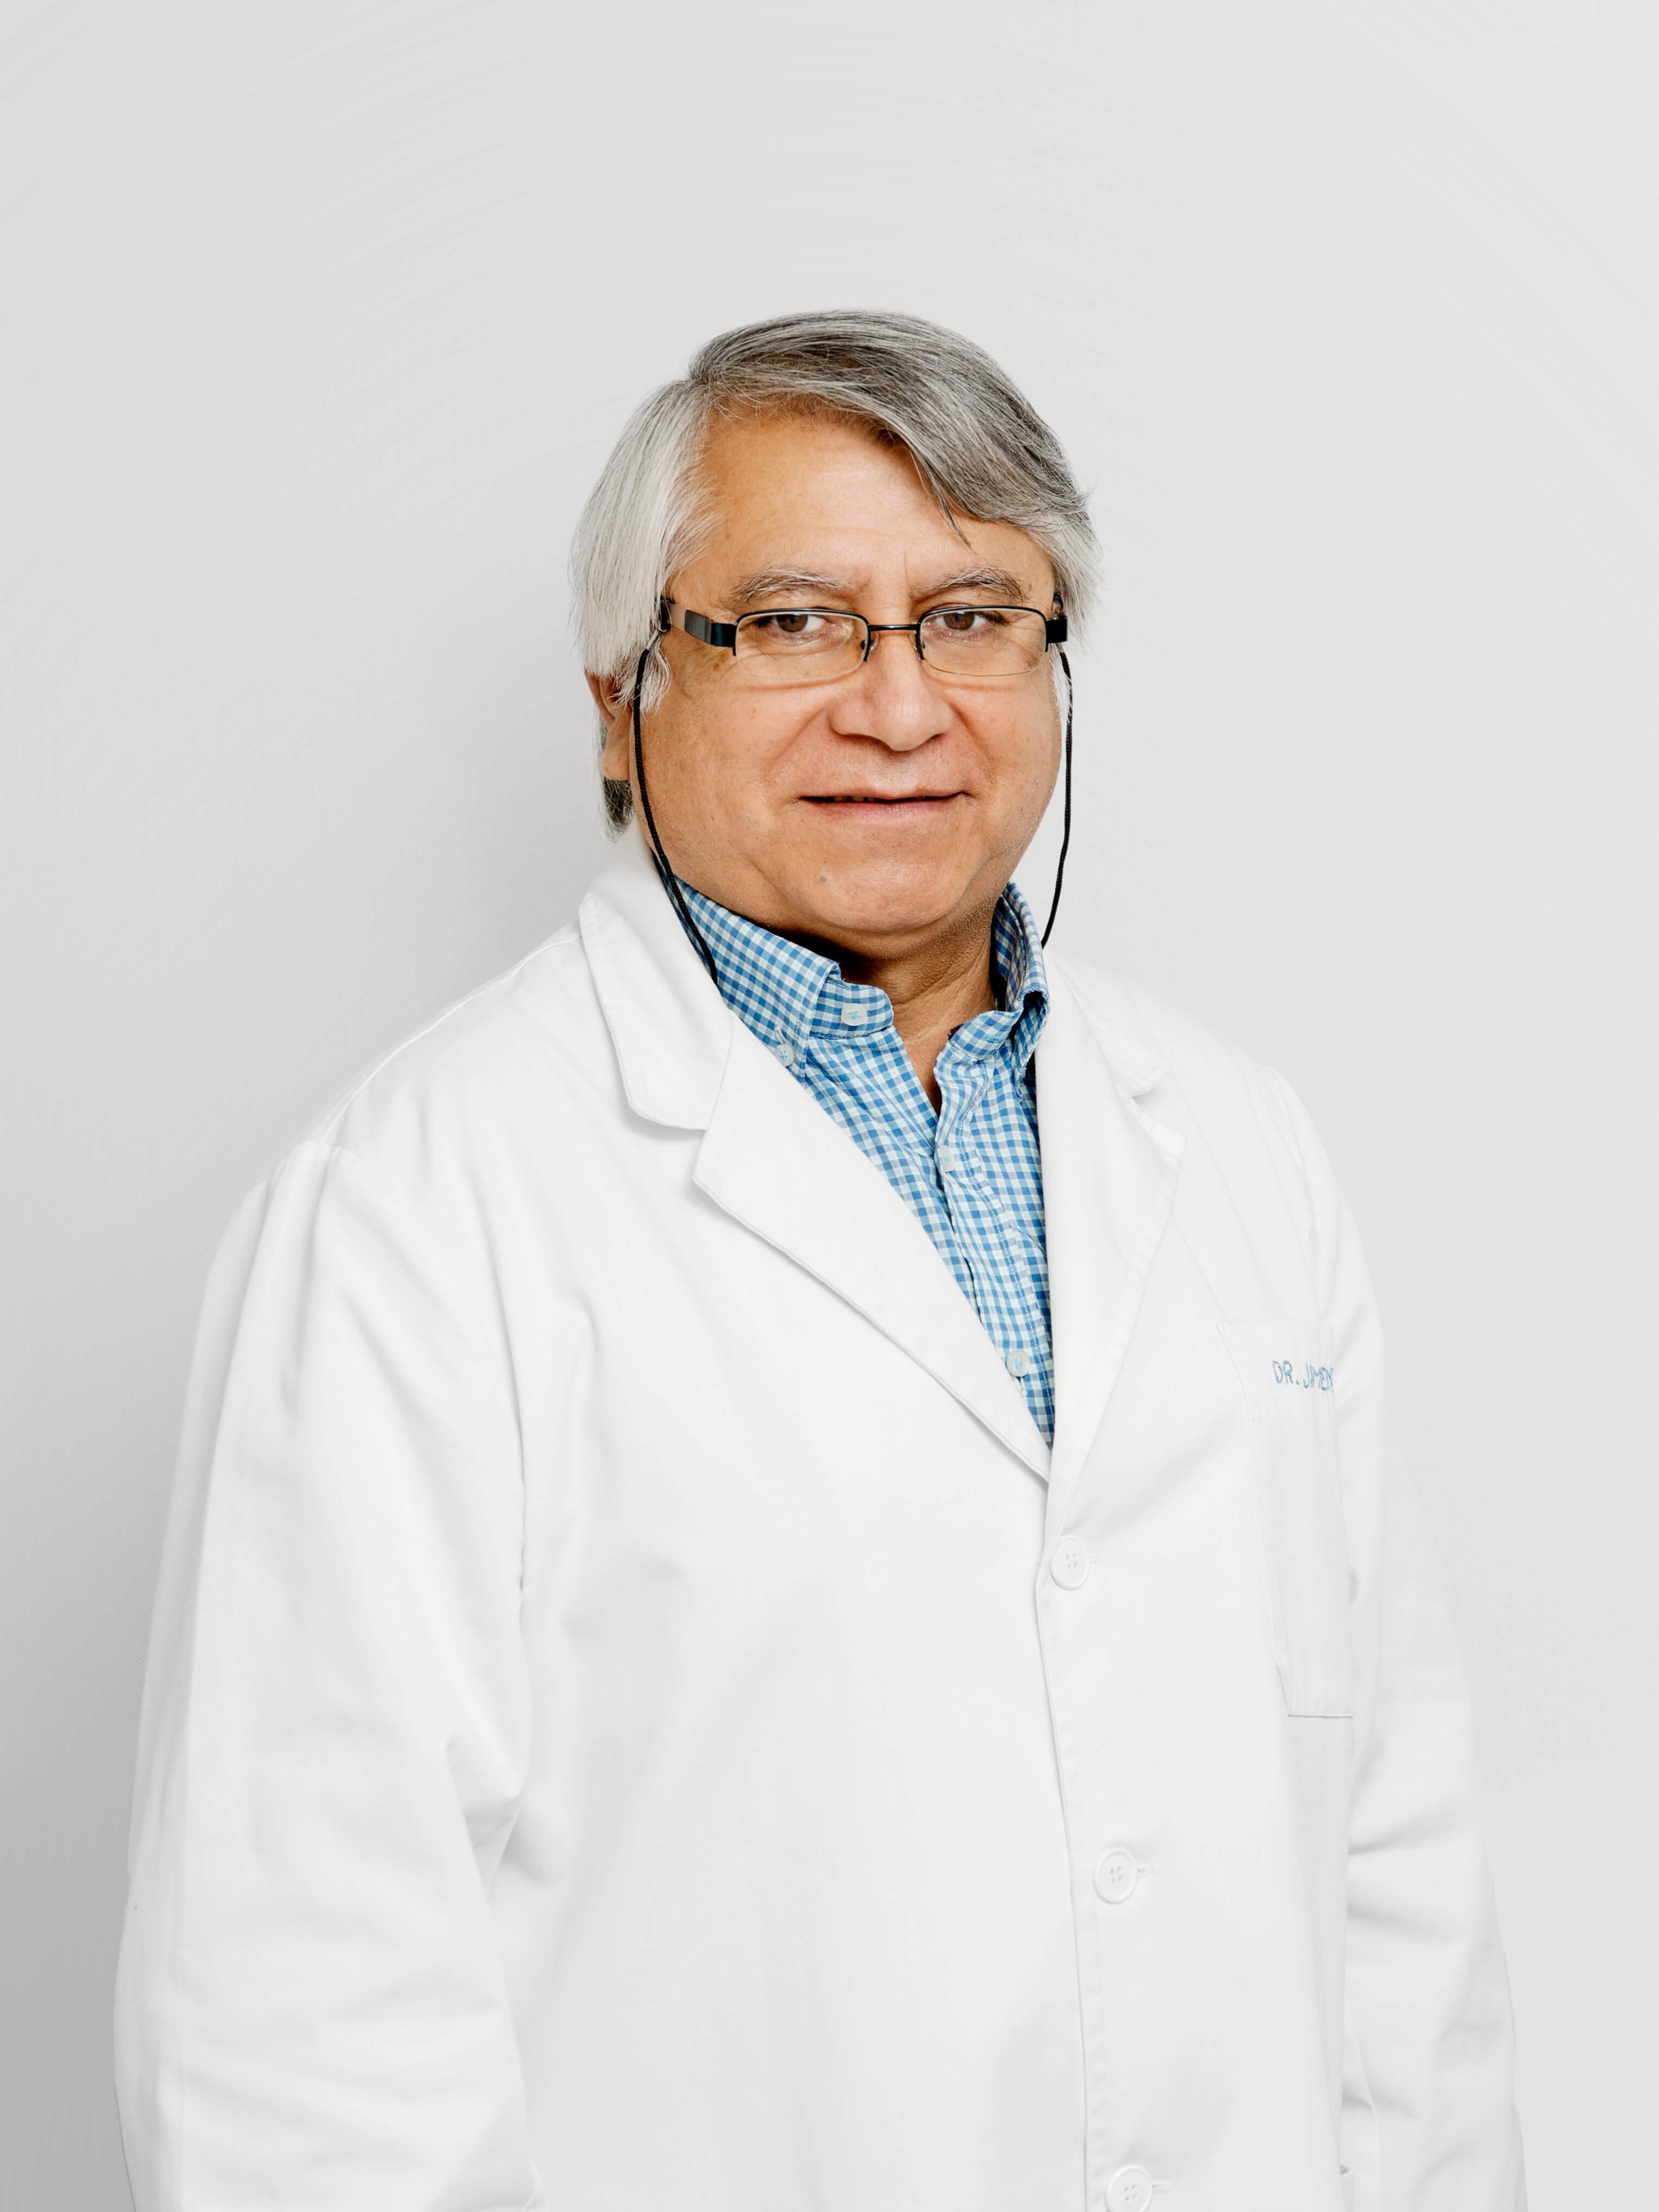 Dr. Gonzalo Jiménez Alba